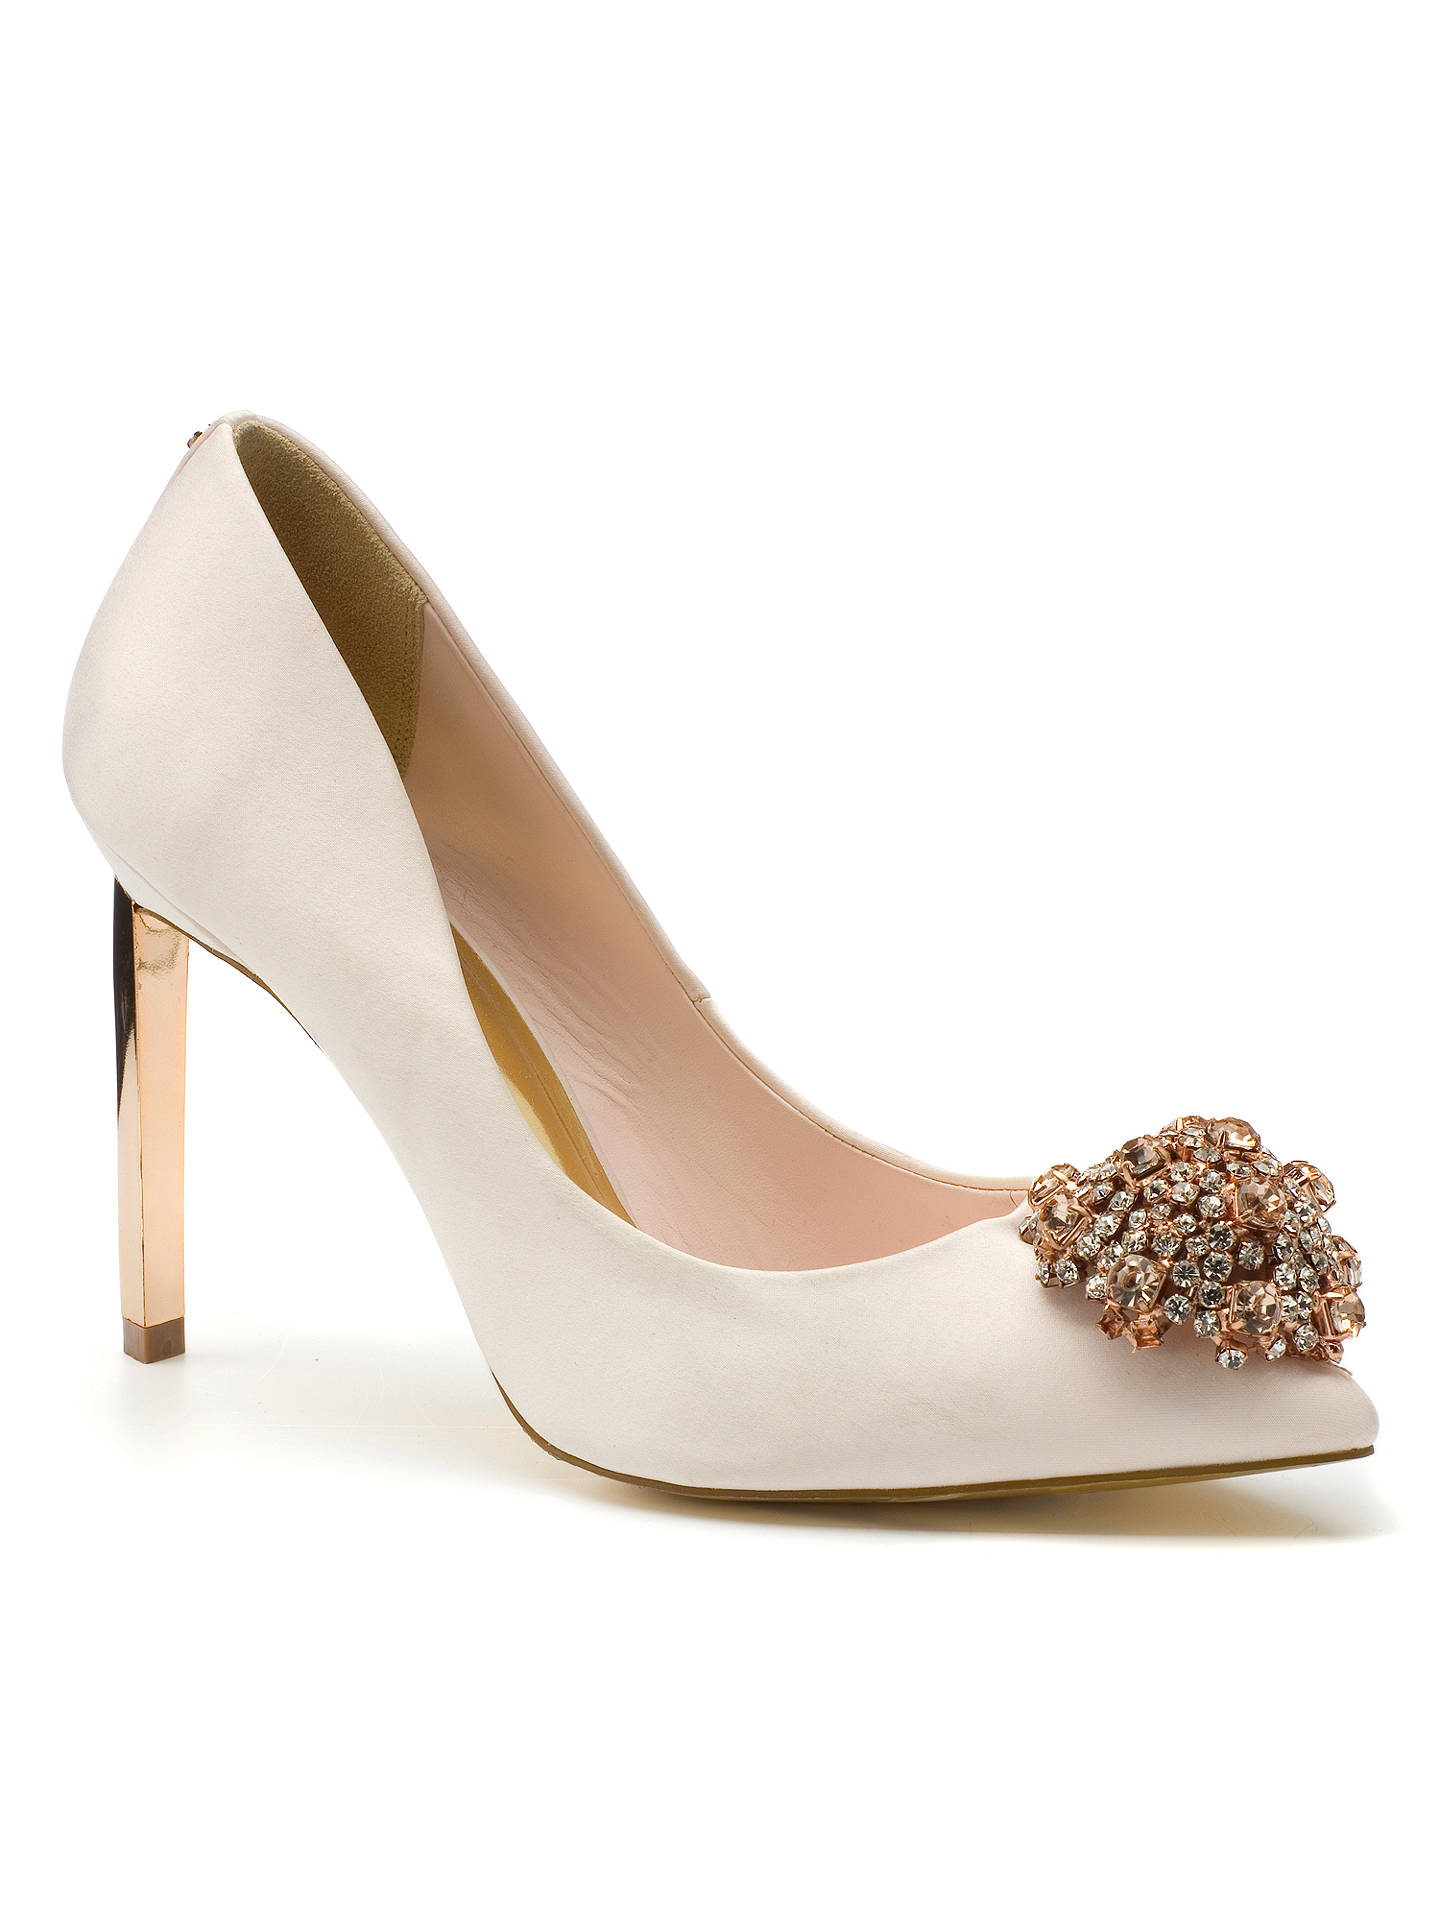 ae1de53ec42e66 Buy Ted Baker Peetch Court Shoes